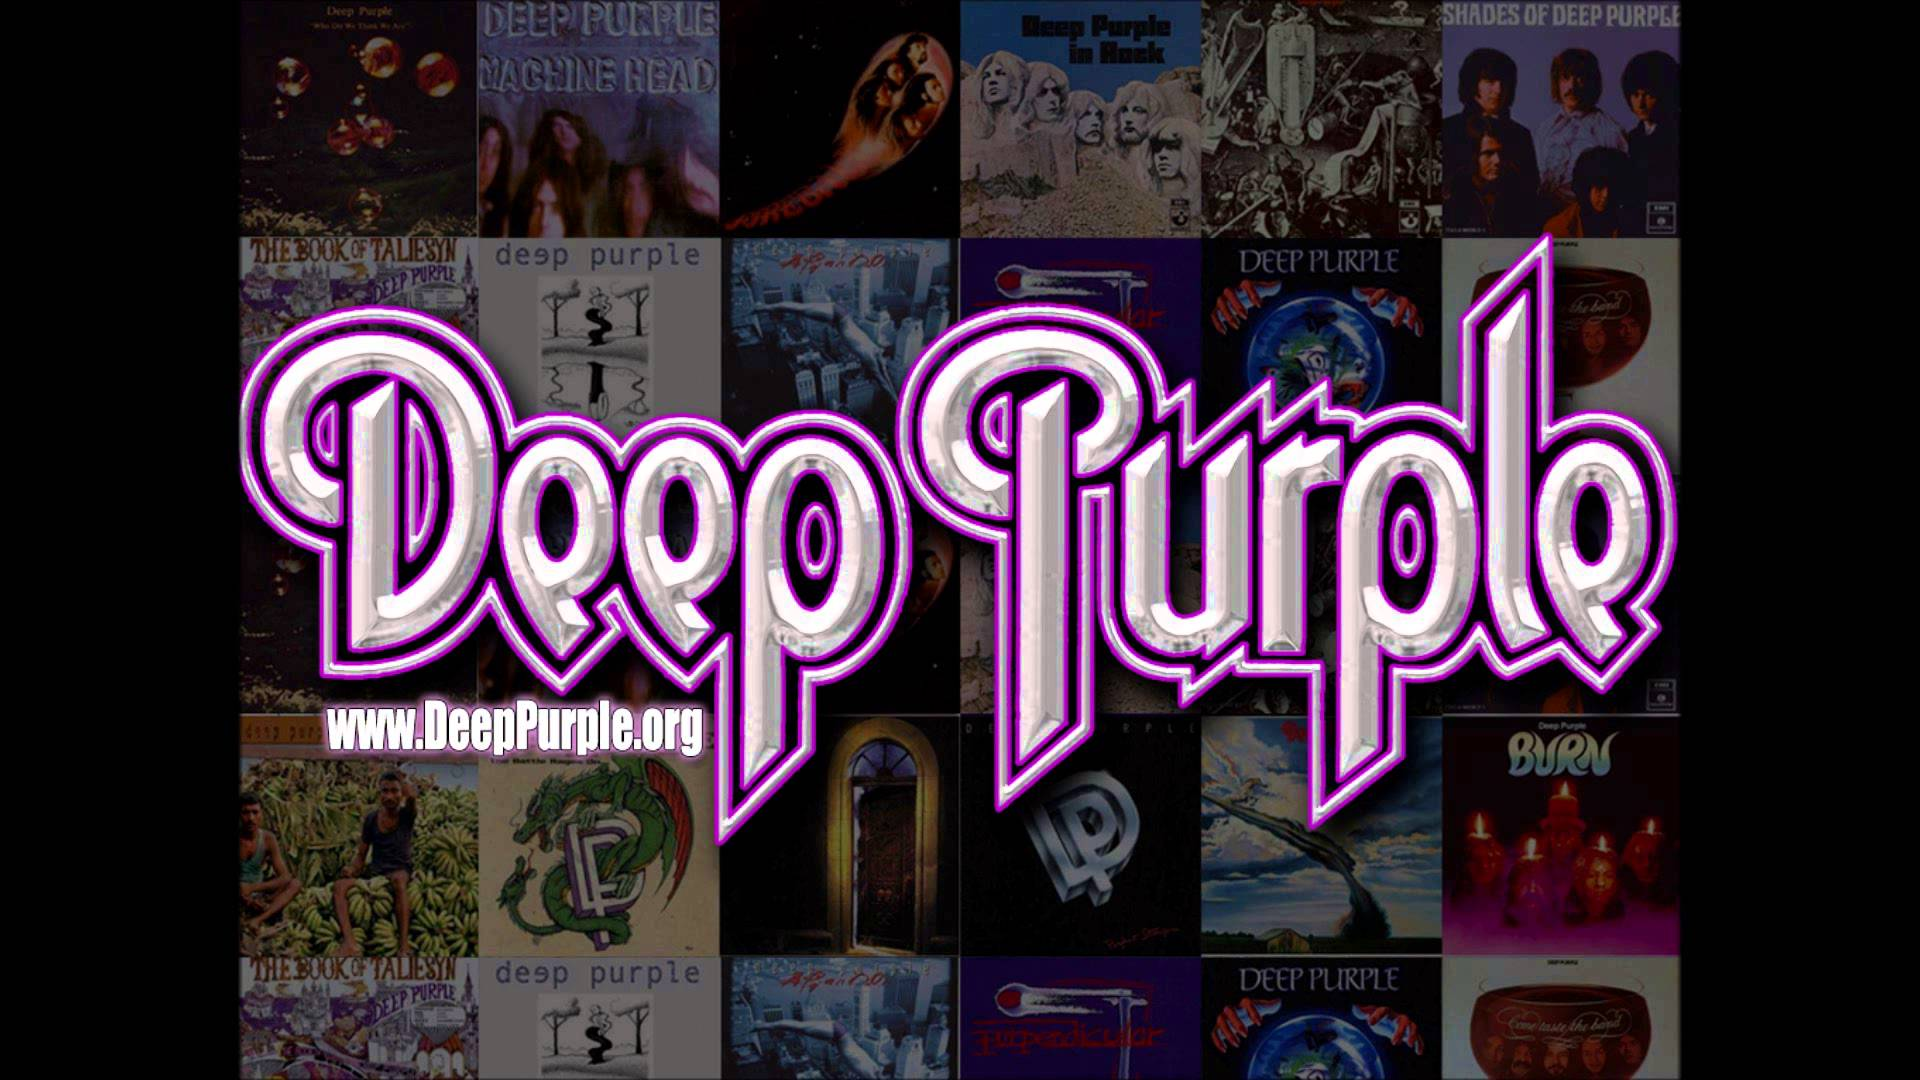 Deep Purple - Smoke On The Water (HD) - YouTube